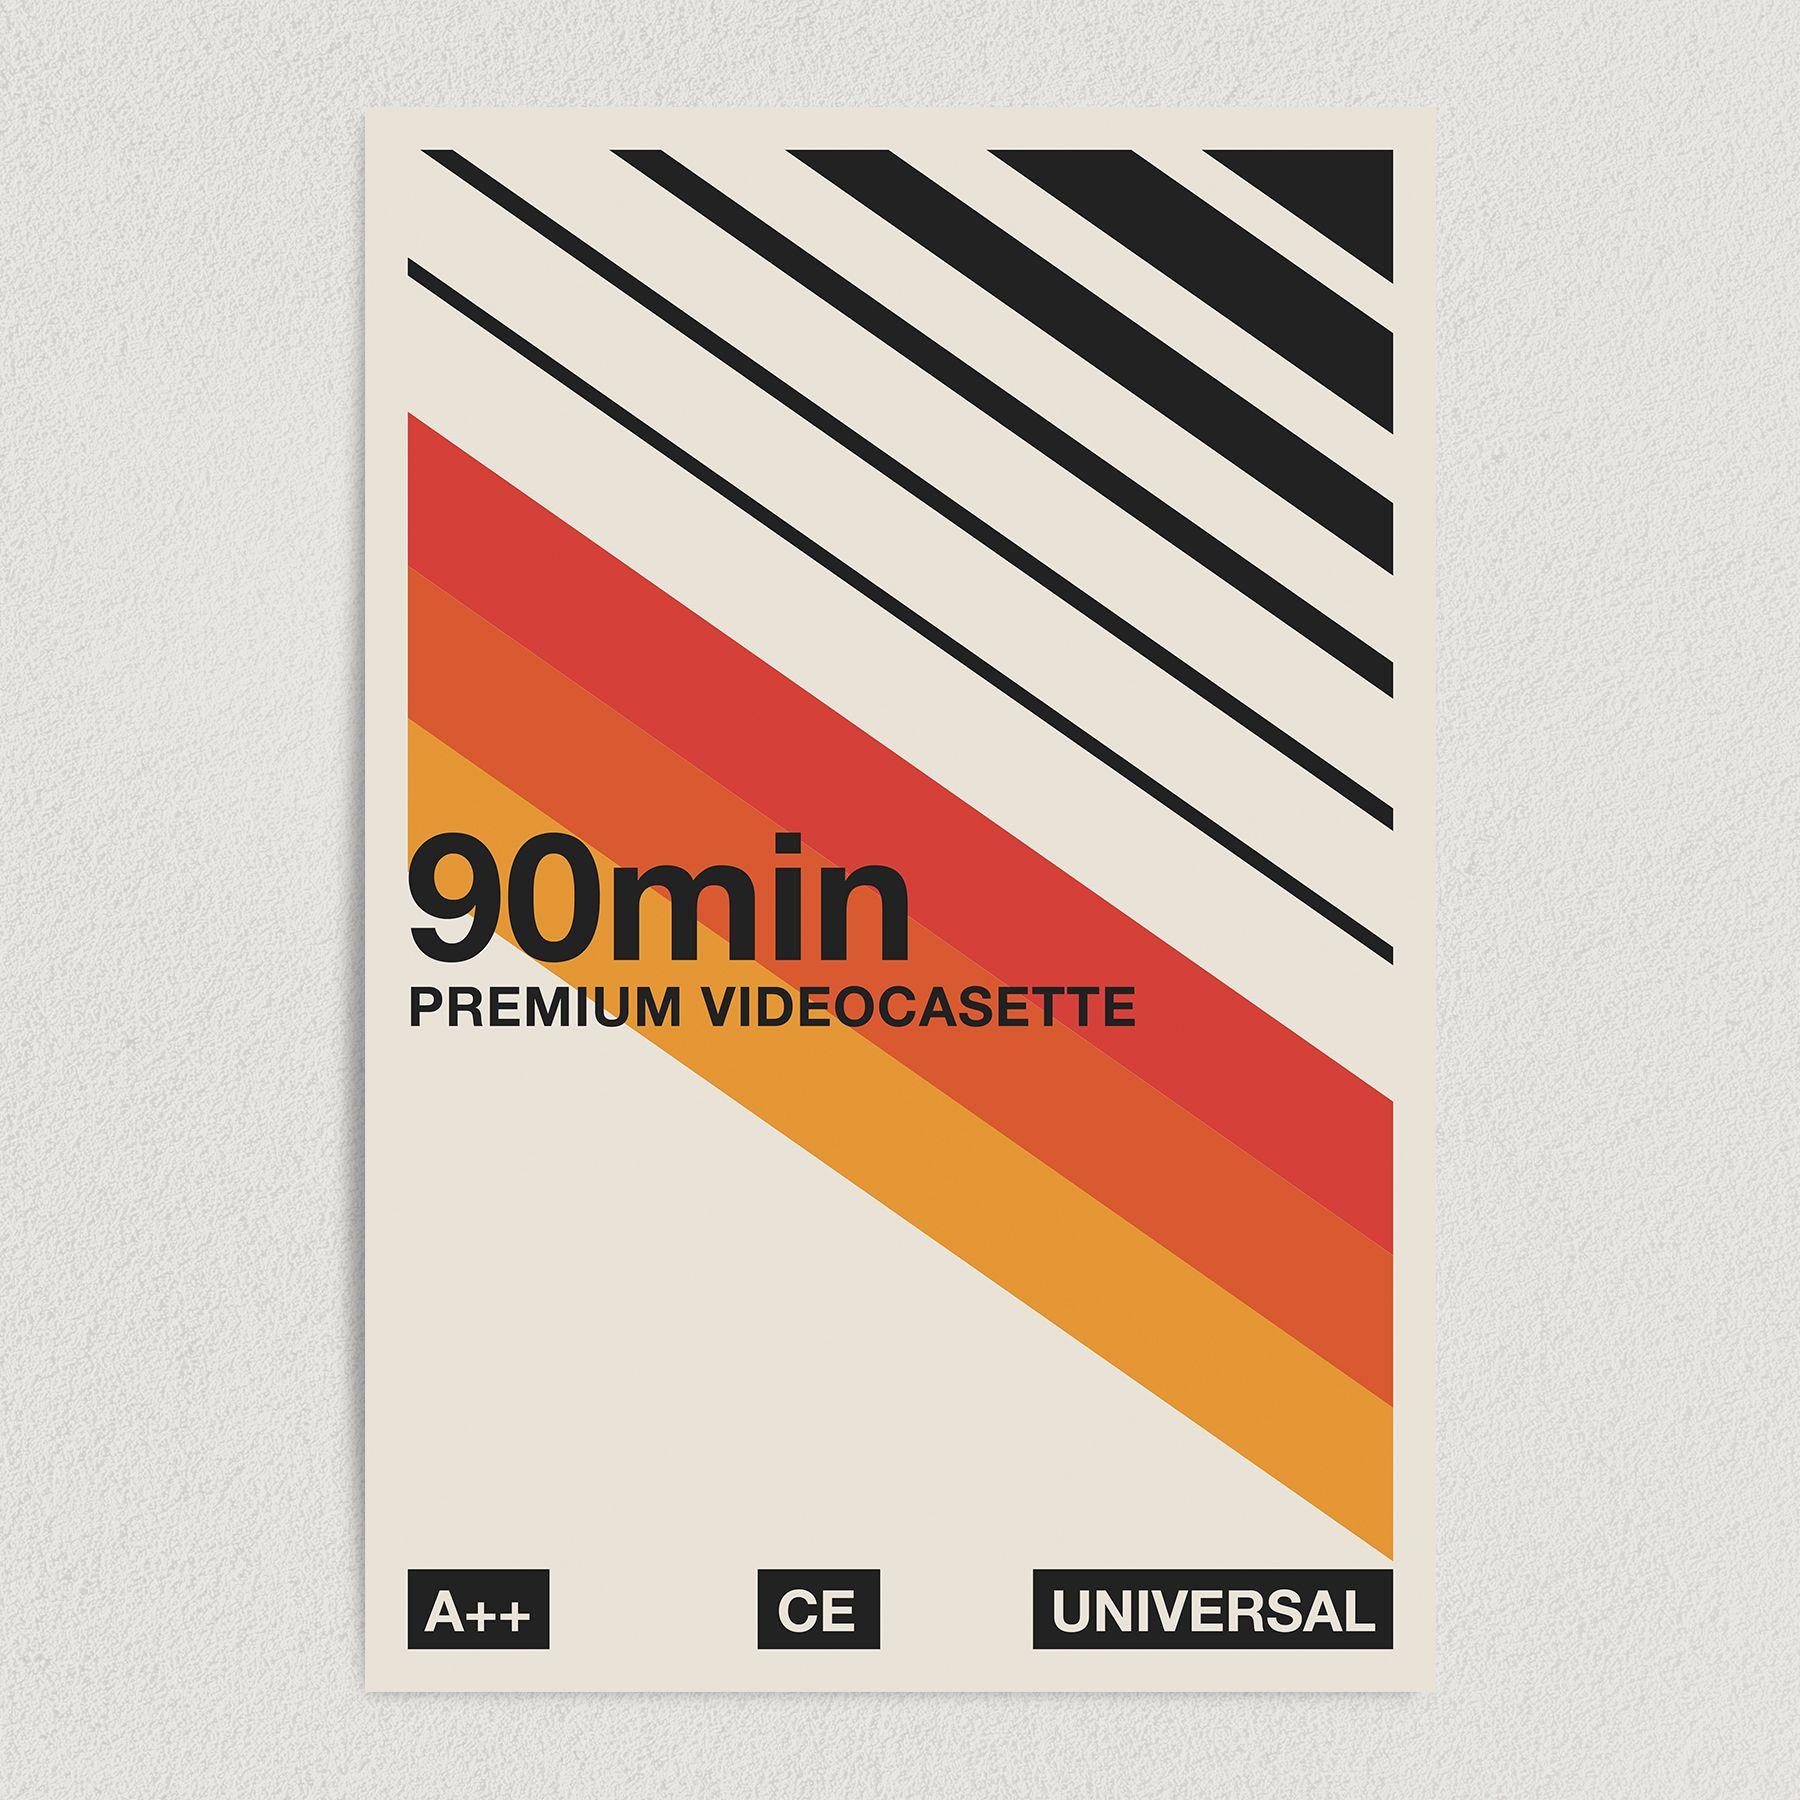 90min Premium Videocassette Vintage Art Print Poster 12″ x 18″ Wall Art Template V2199